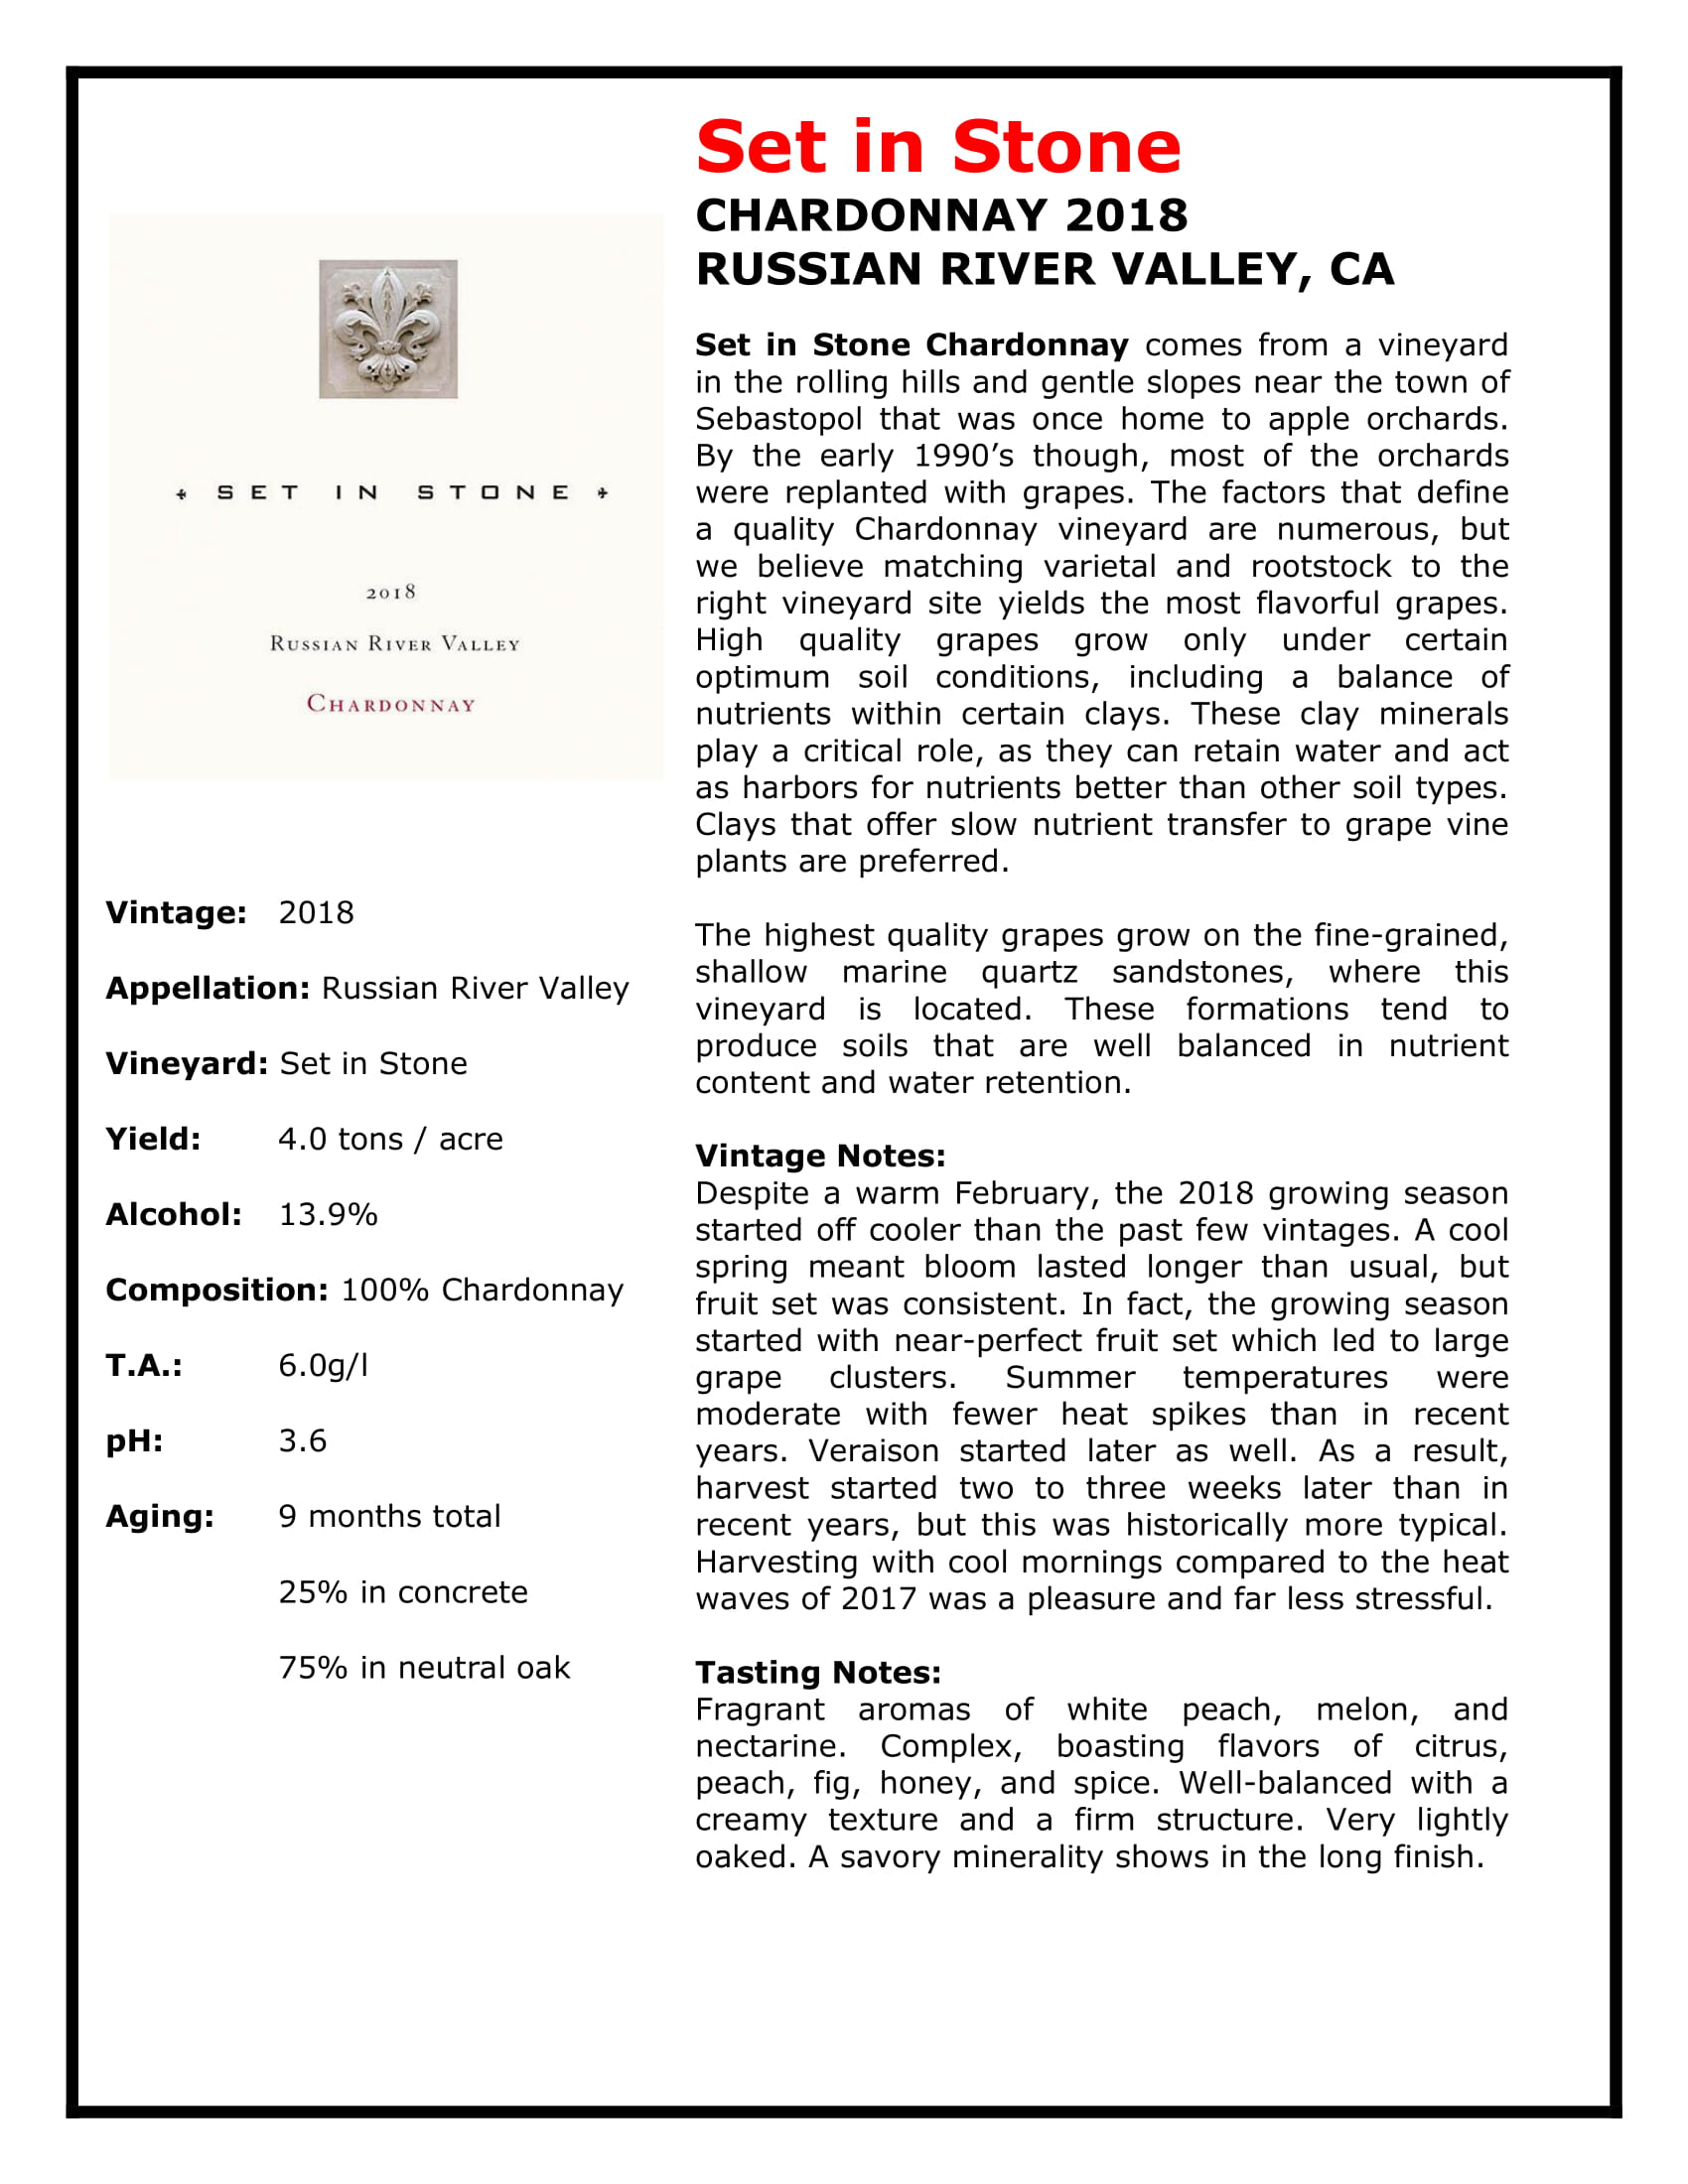 Set In Stone Chardonnay Tech Sheet